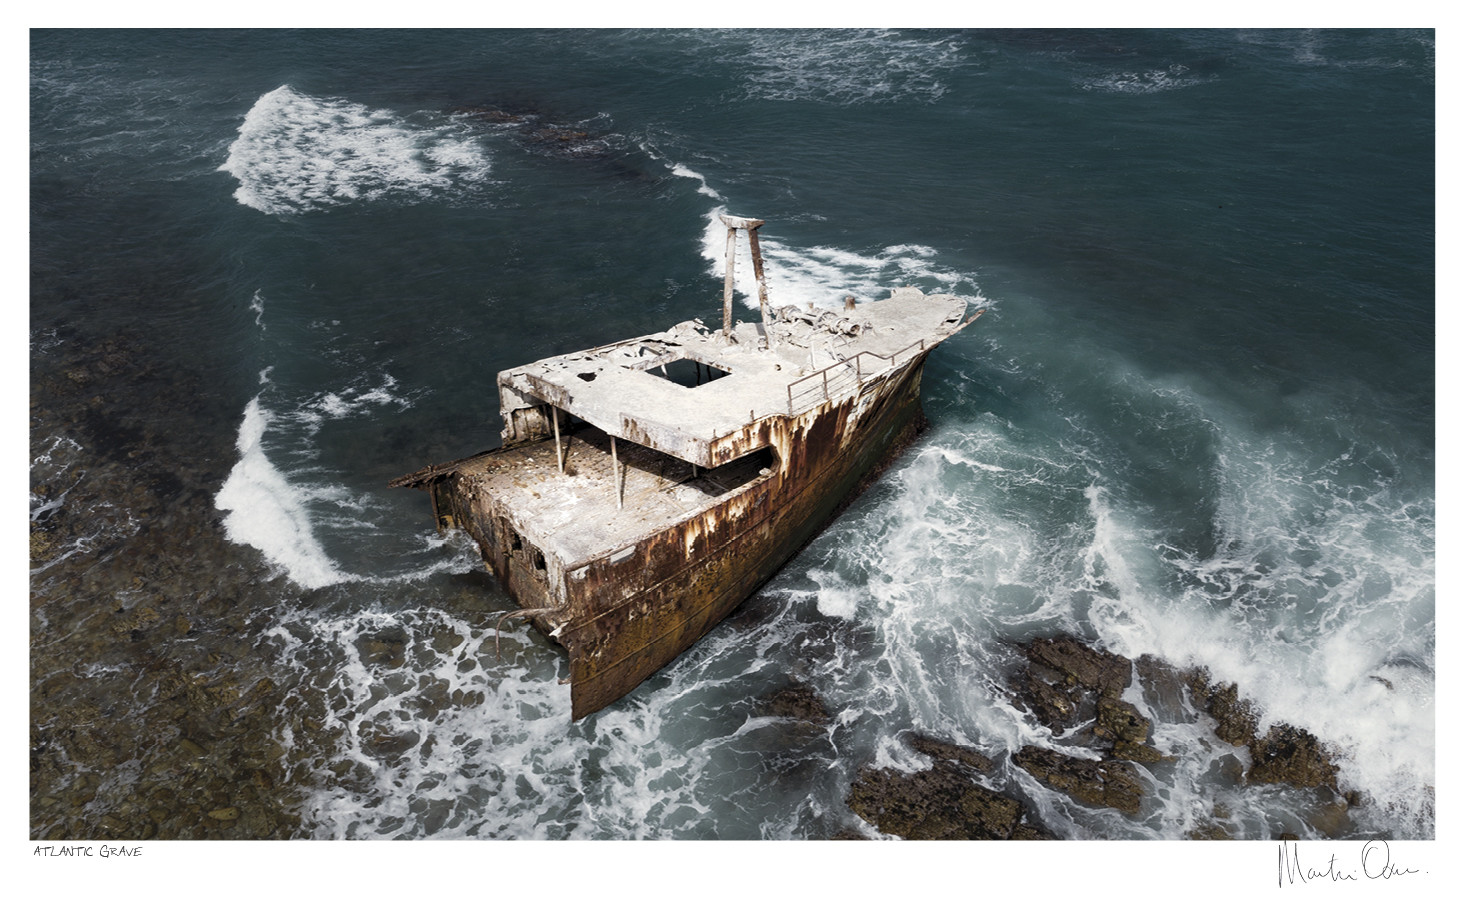 From Above | Atlantic Grave | Martin Osner